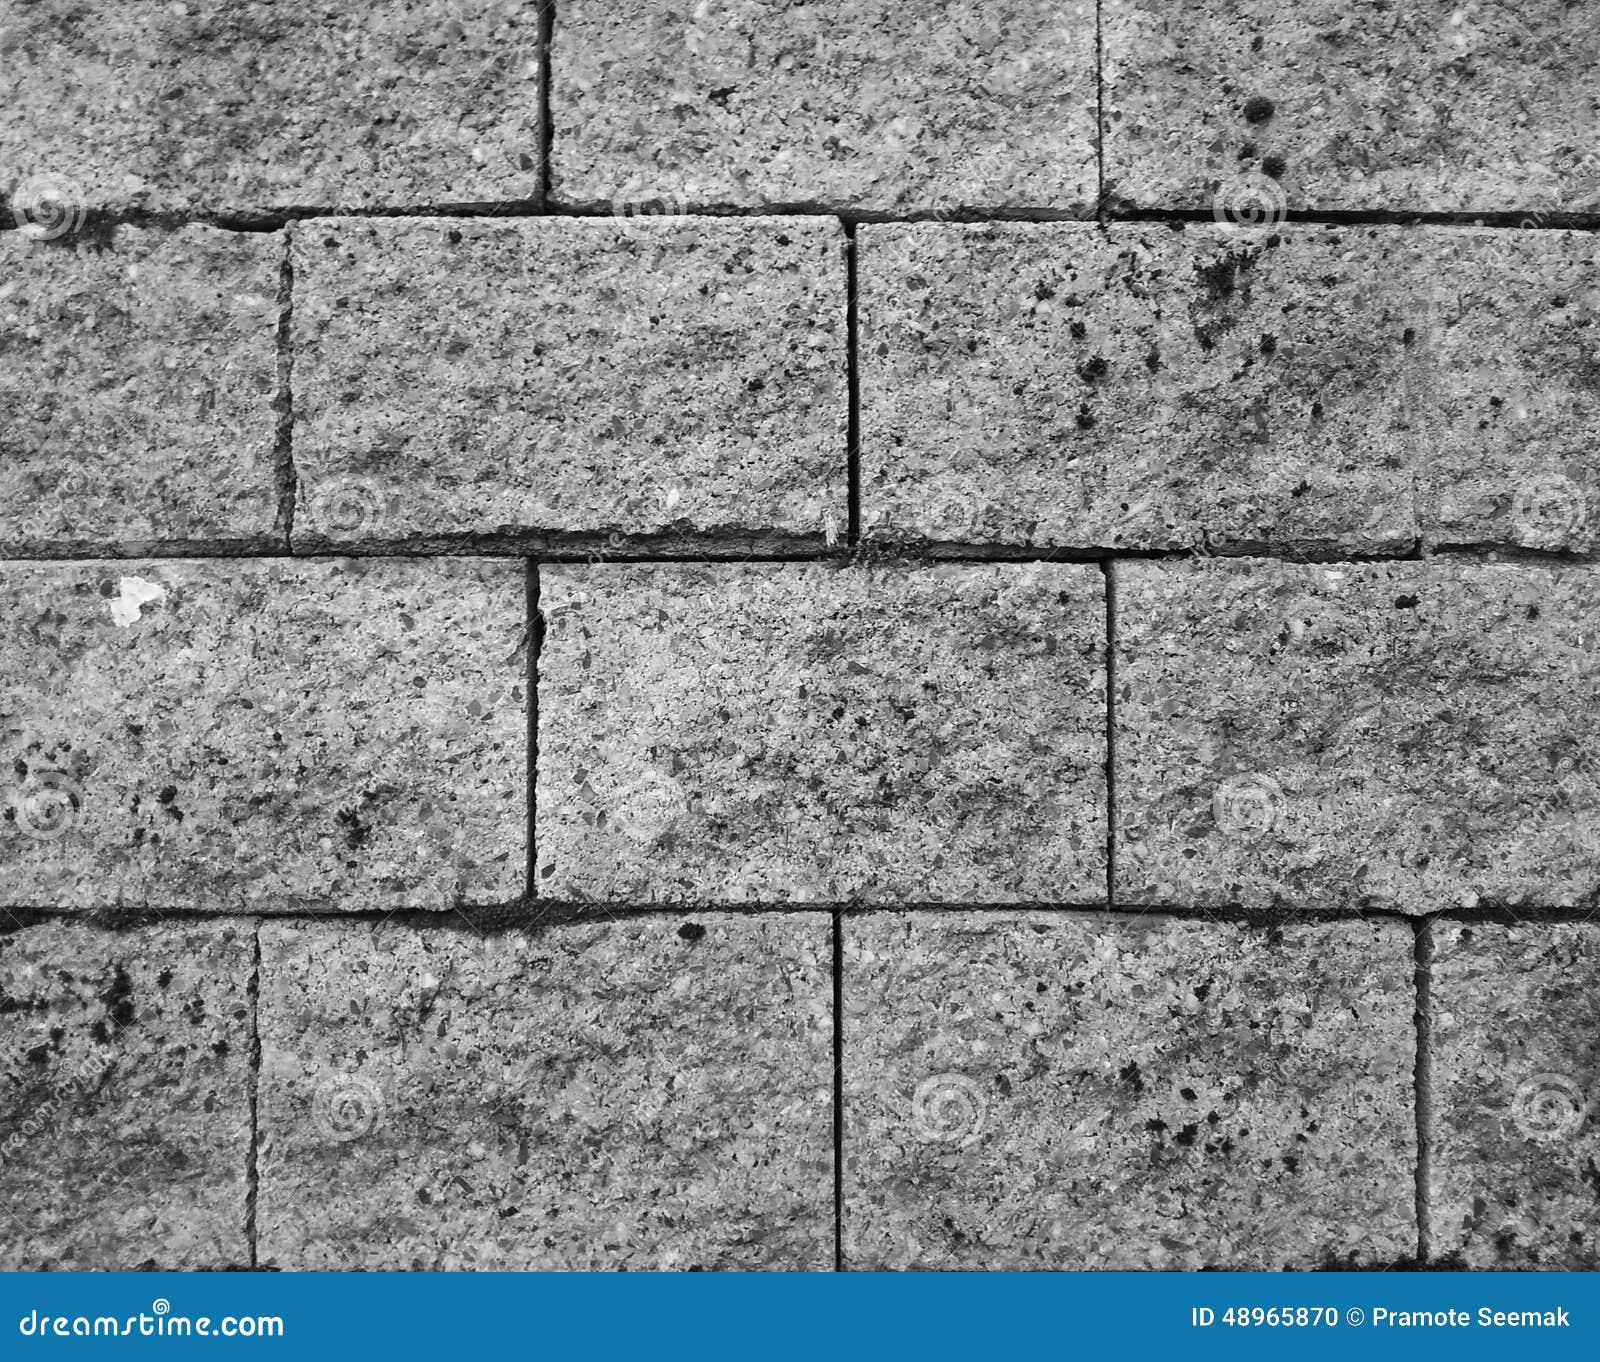 Pattern of concrete block